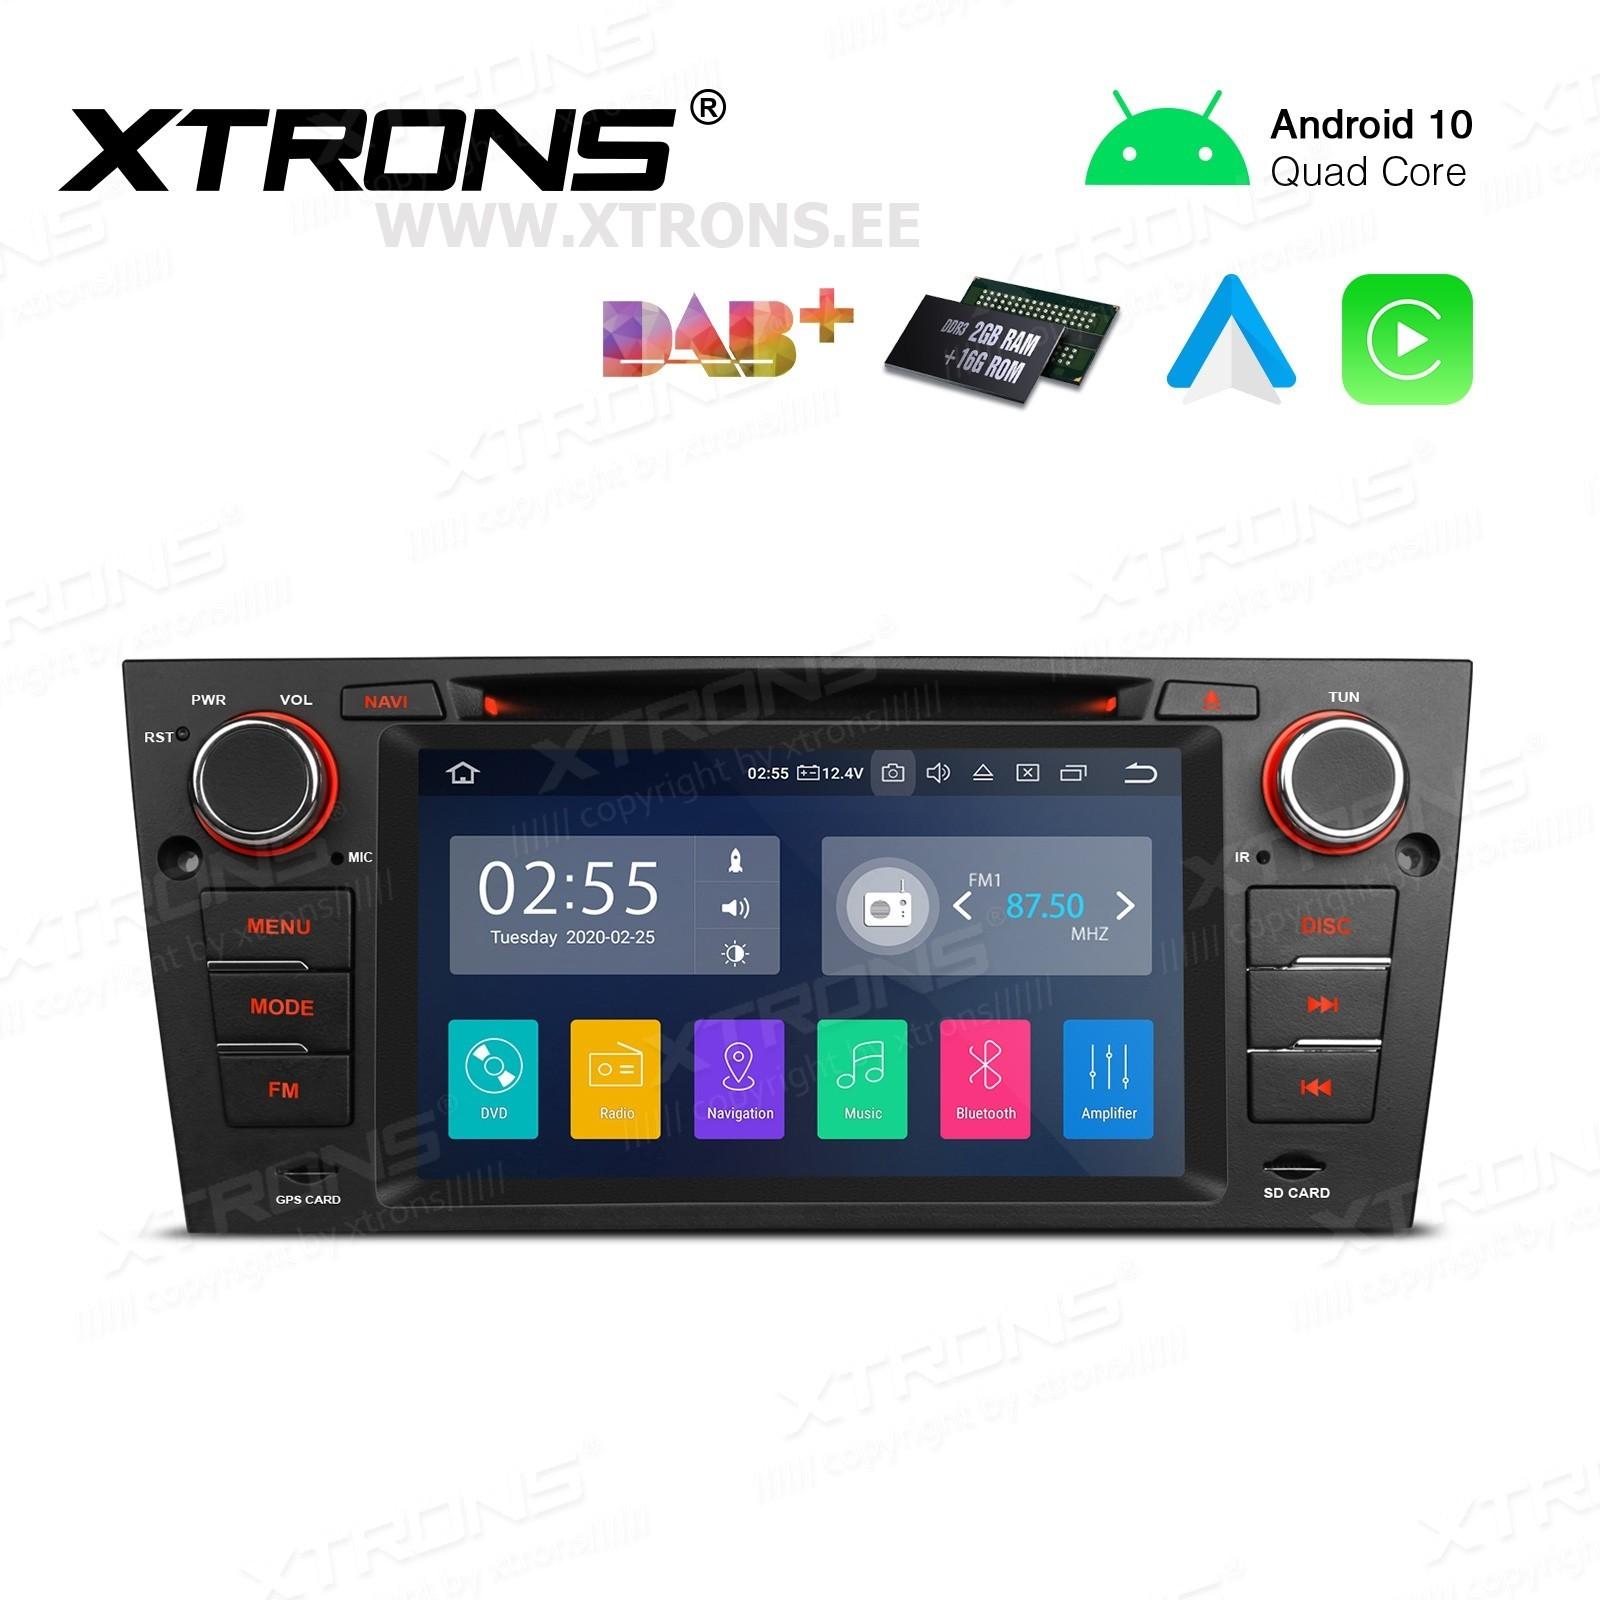 XTRONS PA7090B